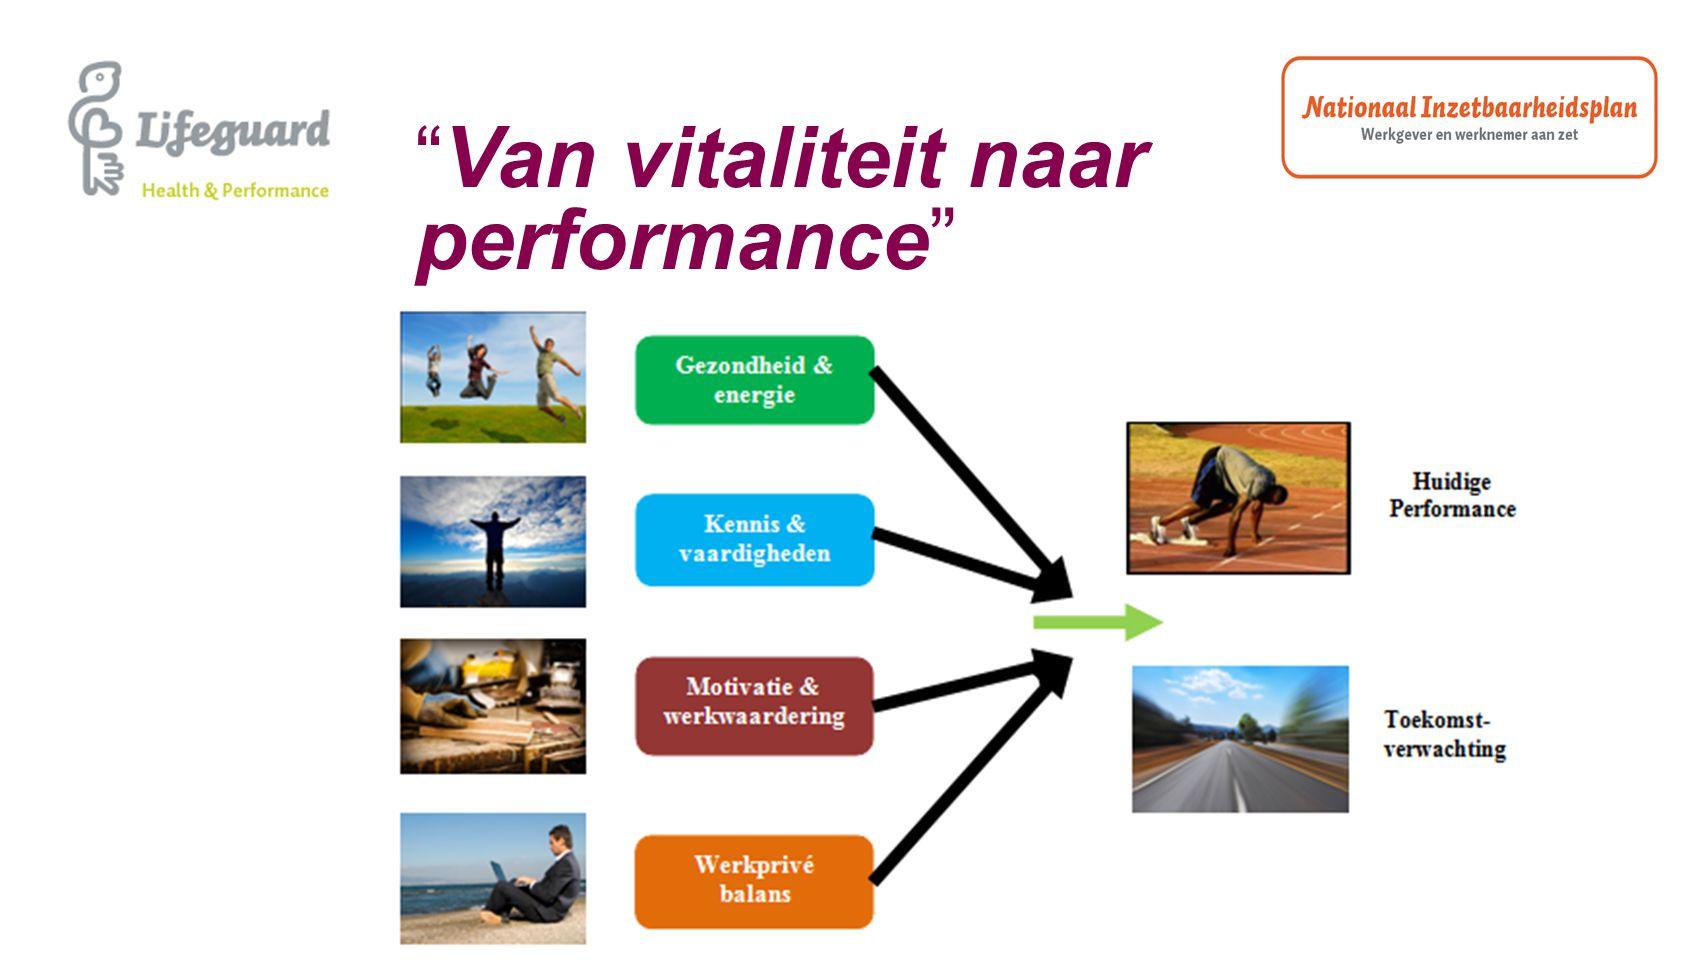 Van vitaliteit naar performance